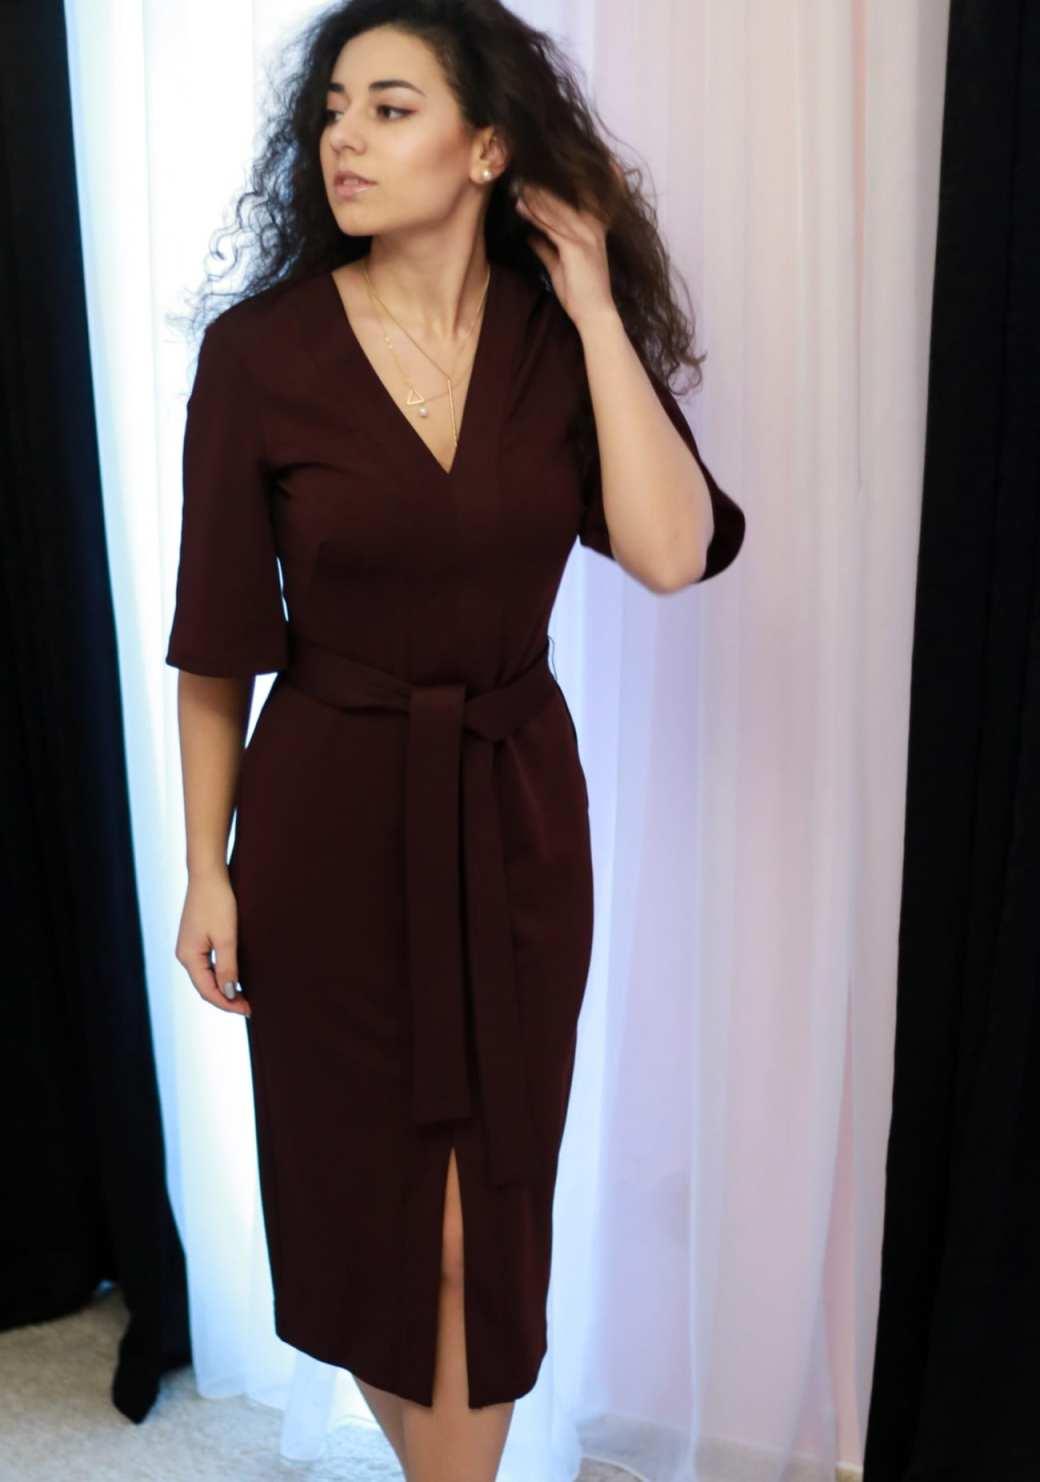 femei rochie visinie dama burgundy dress womanfashion.ro calitate quality material